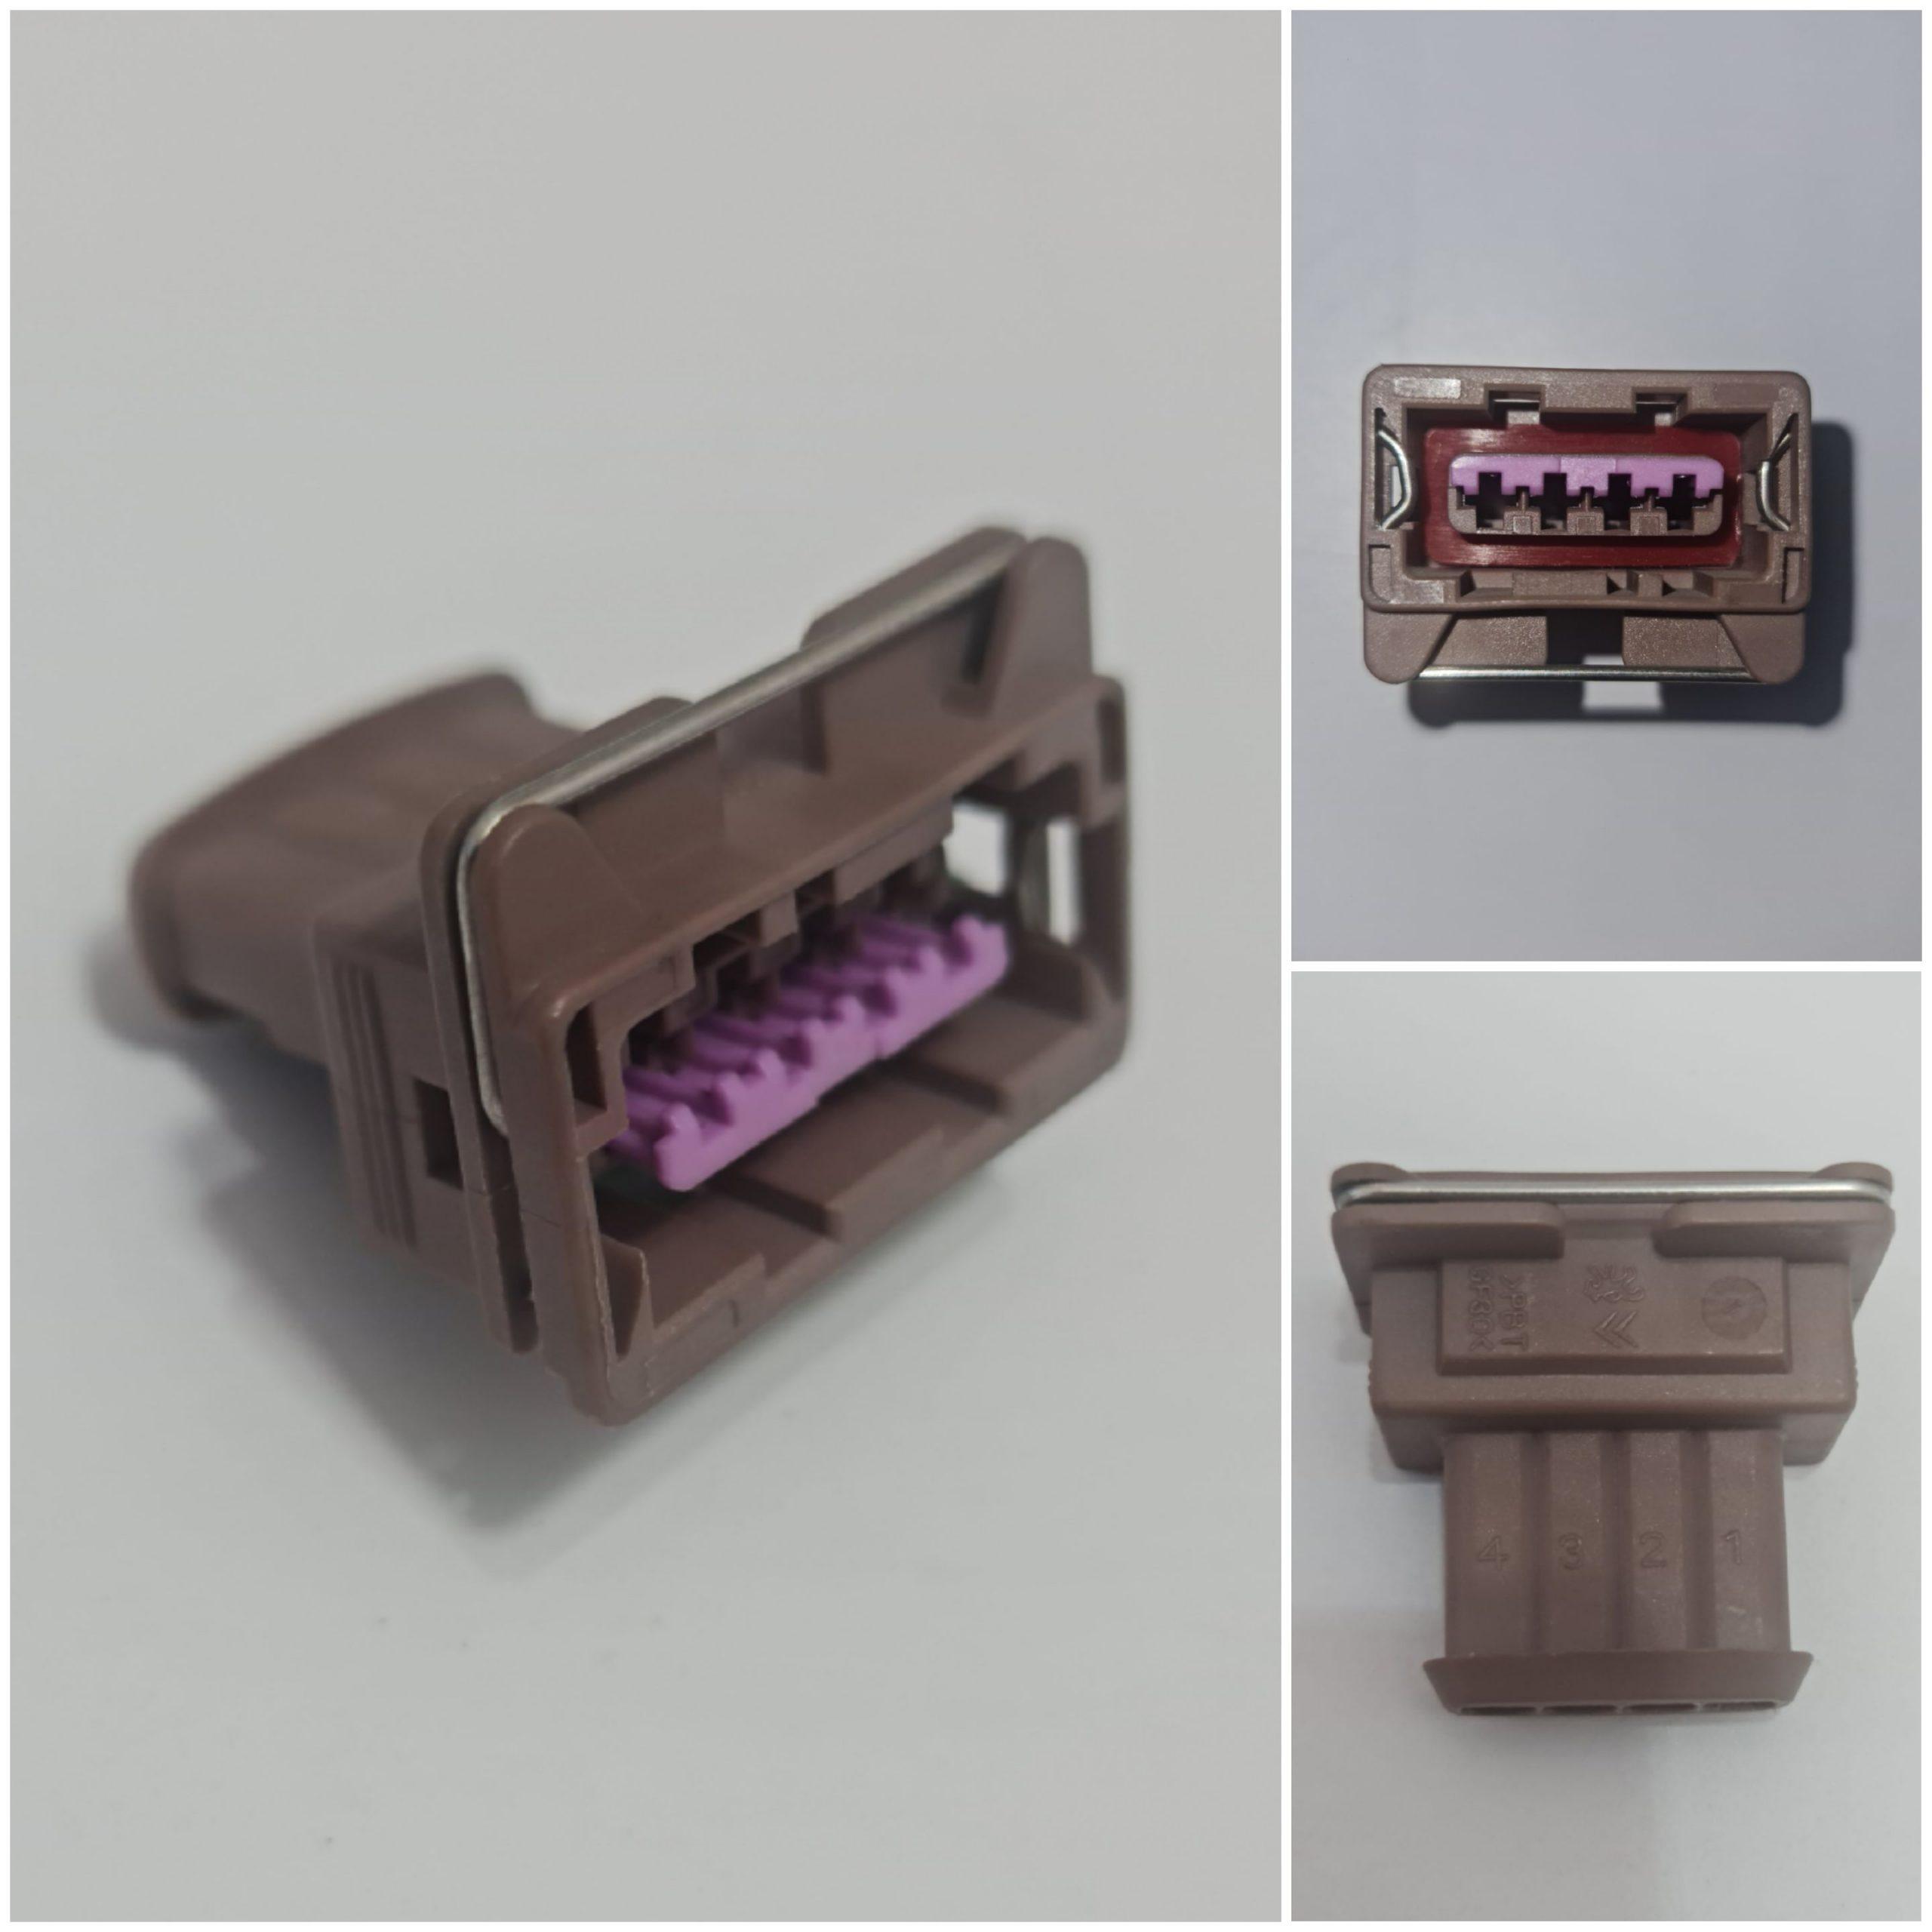 سوکت ۴ خانه قفل فنری قهوه ای/کد :۸۳۰۵۵۰